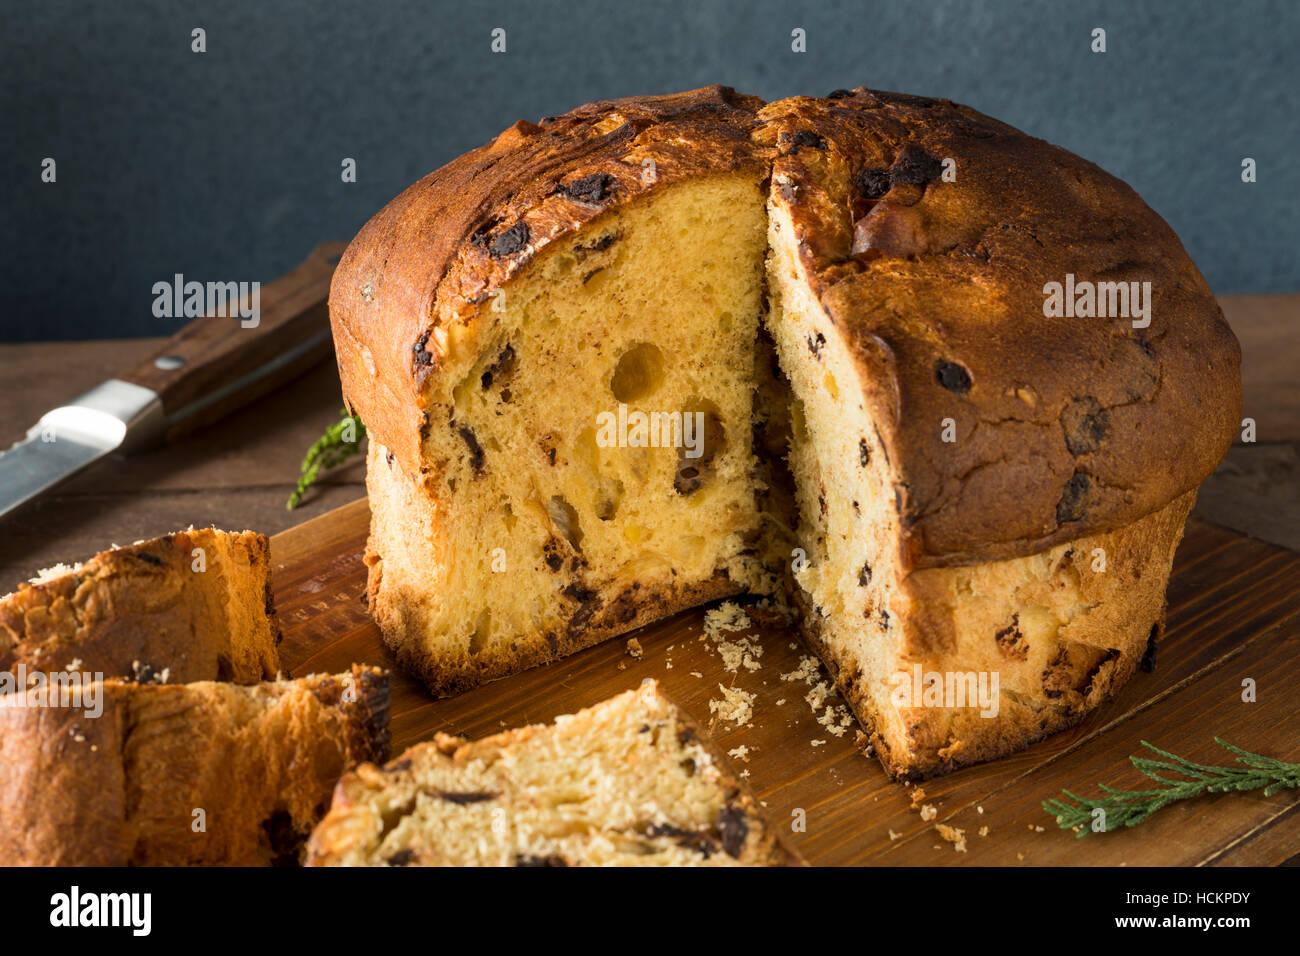 Homemade Chocolate and Fig Pannetone for Christmas - Stock Image